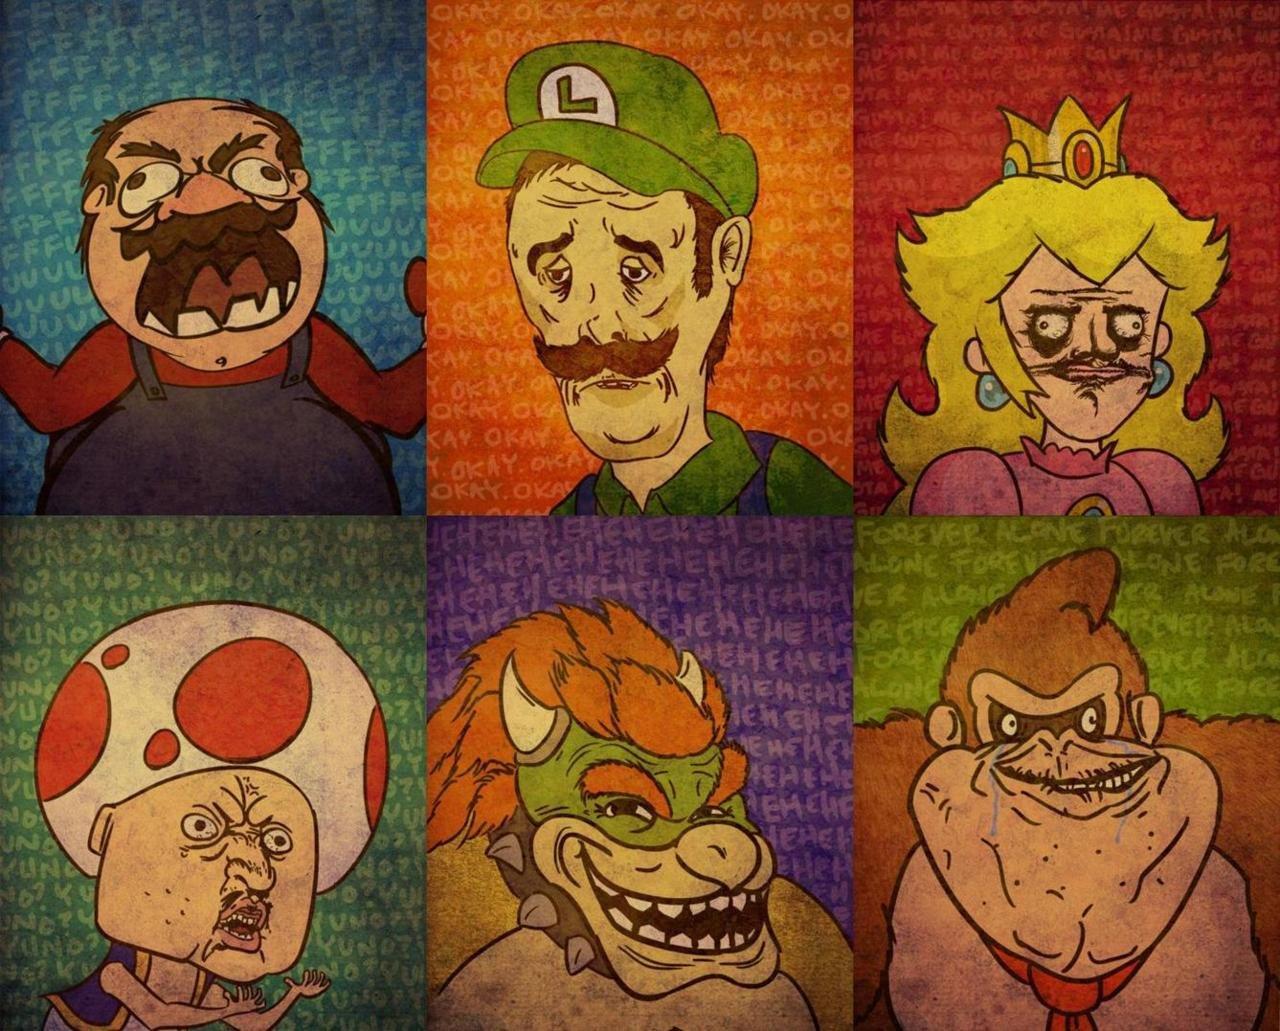 meme mario super bros rage memes face peach kong princess donkey funny faces bowser luigi troll characters gusta toad nintendo